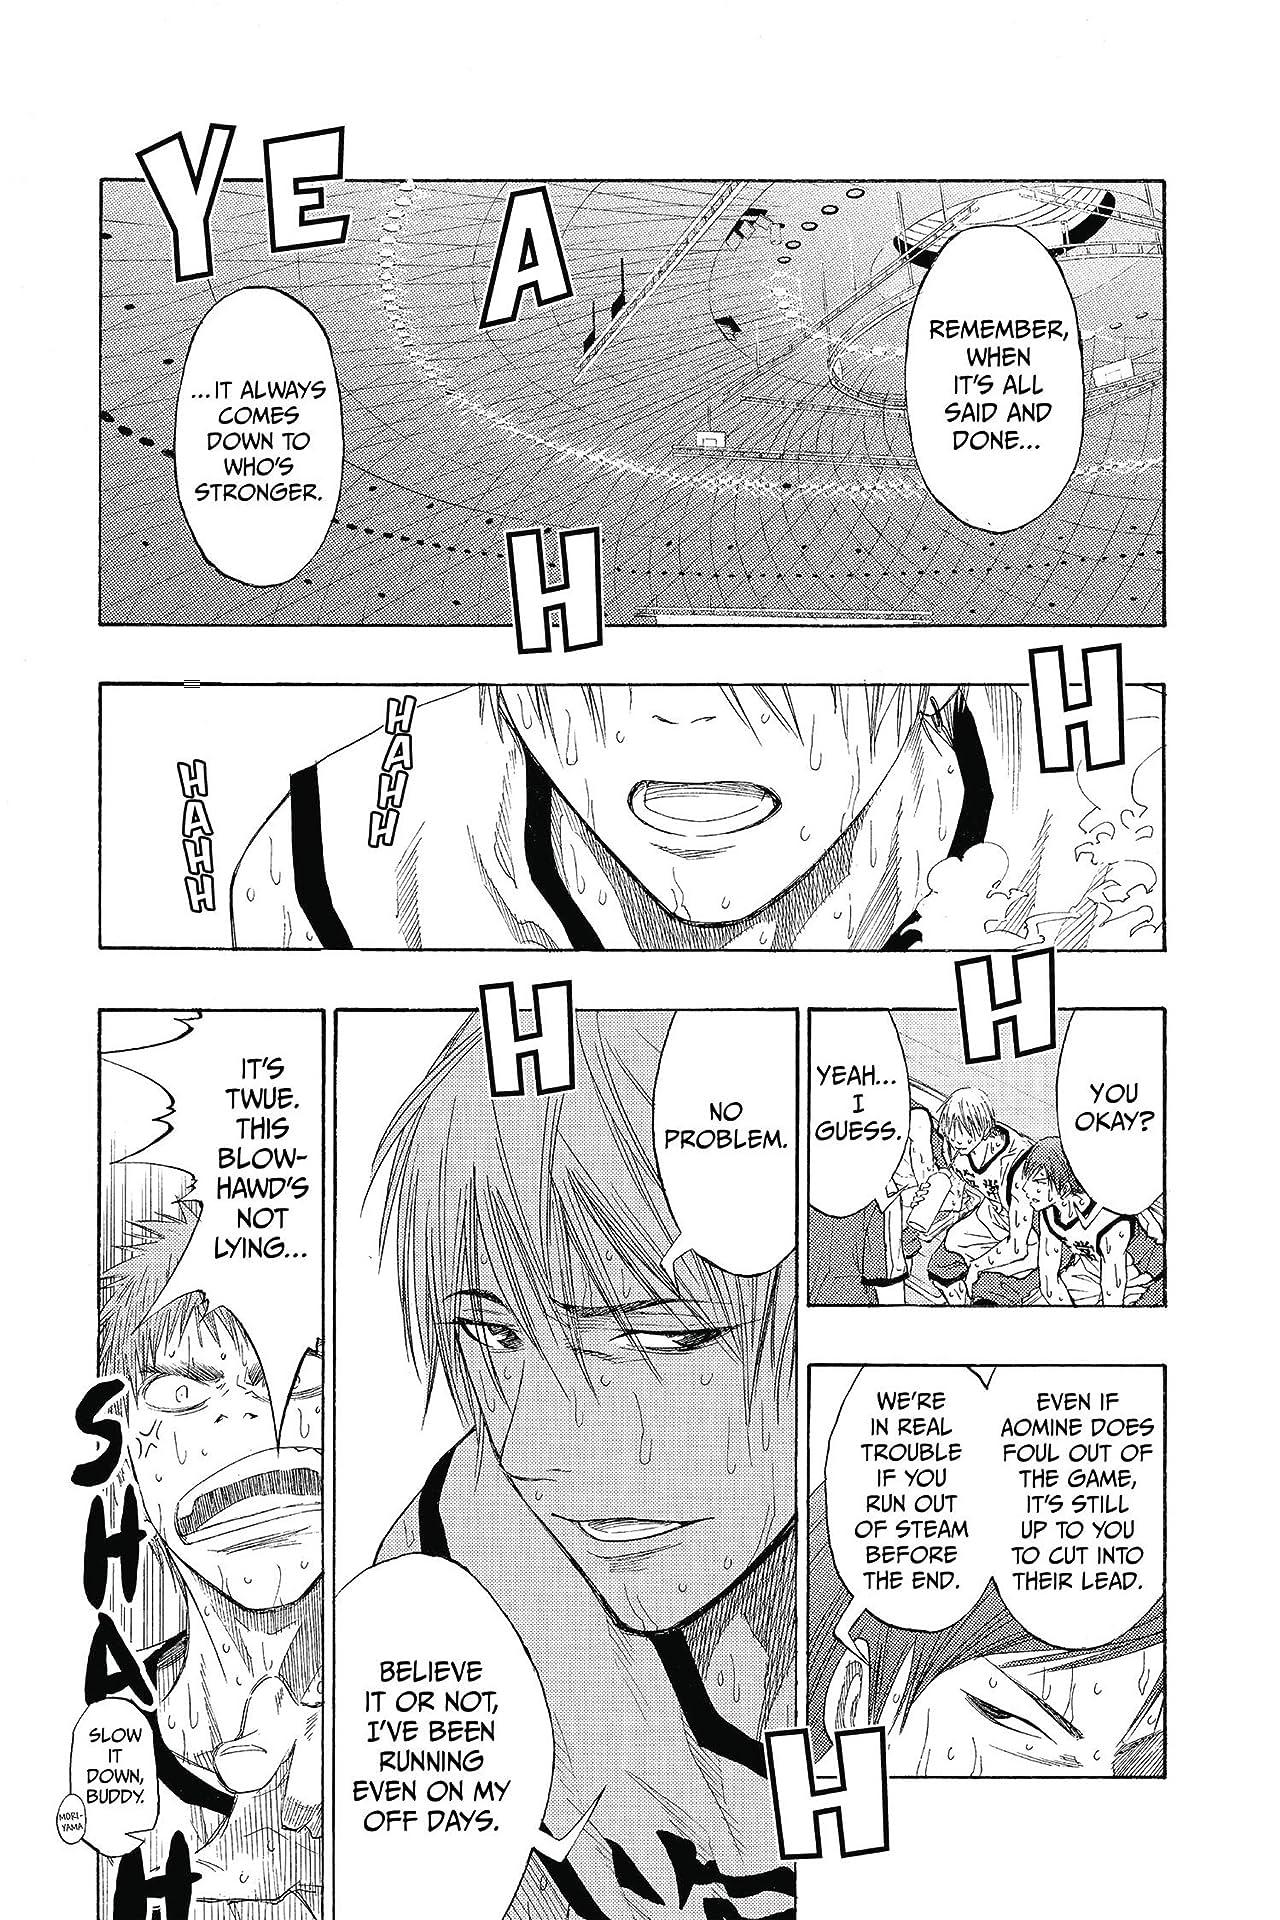 Kuroko's Basketball Vol. 5